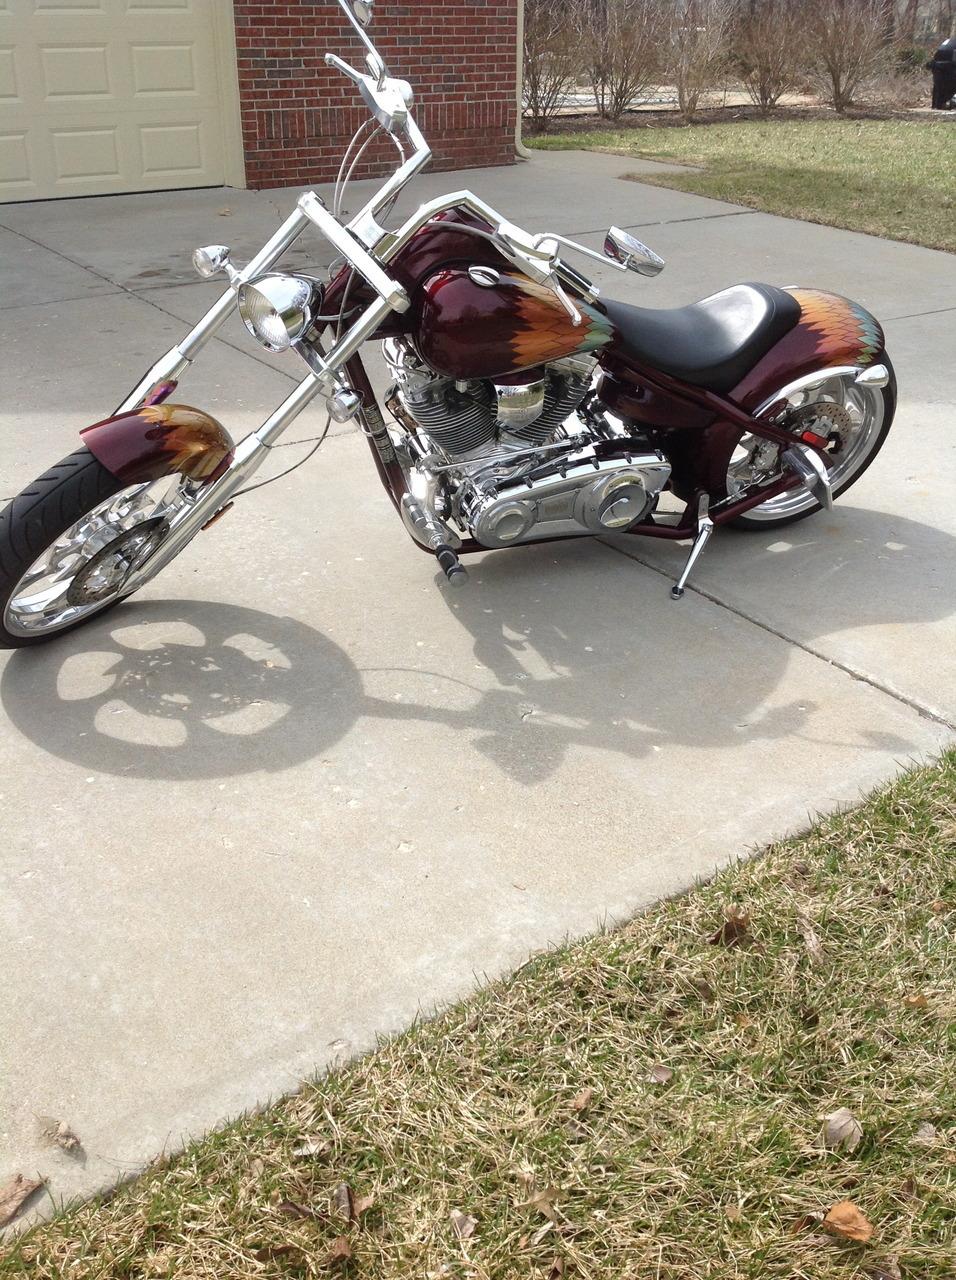 Black Hookup In Raleigh Nc Craigslist Motorcycles For Sale